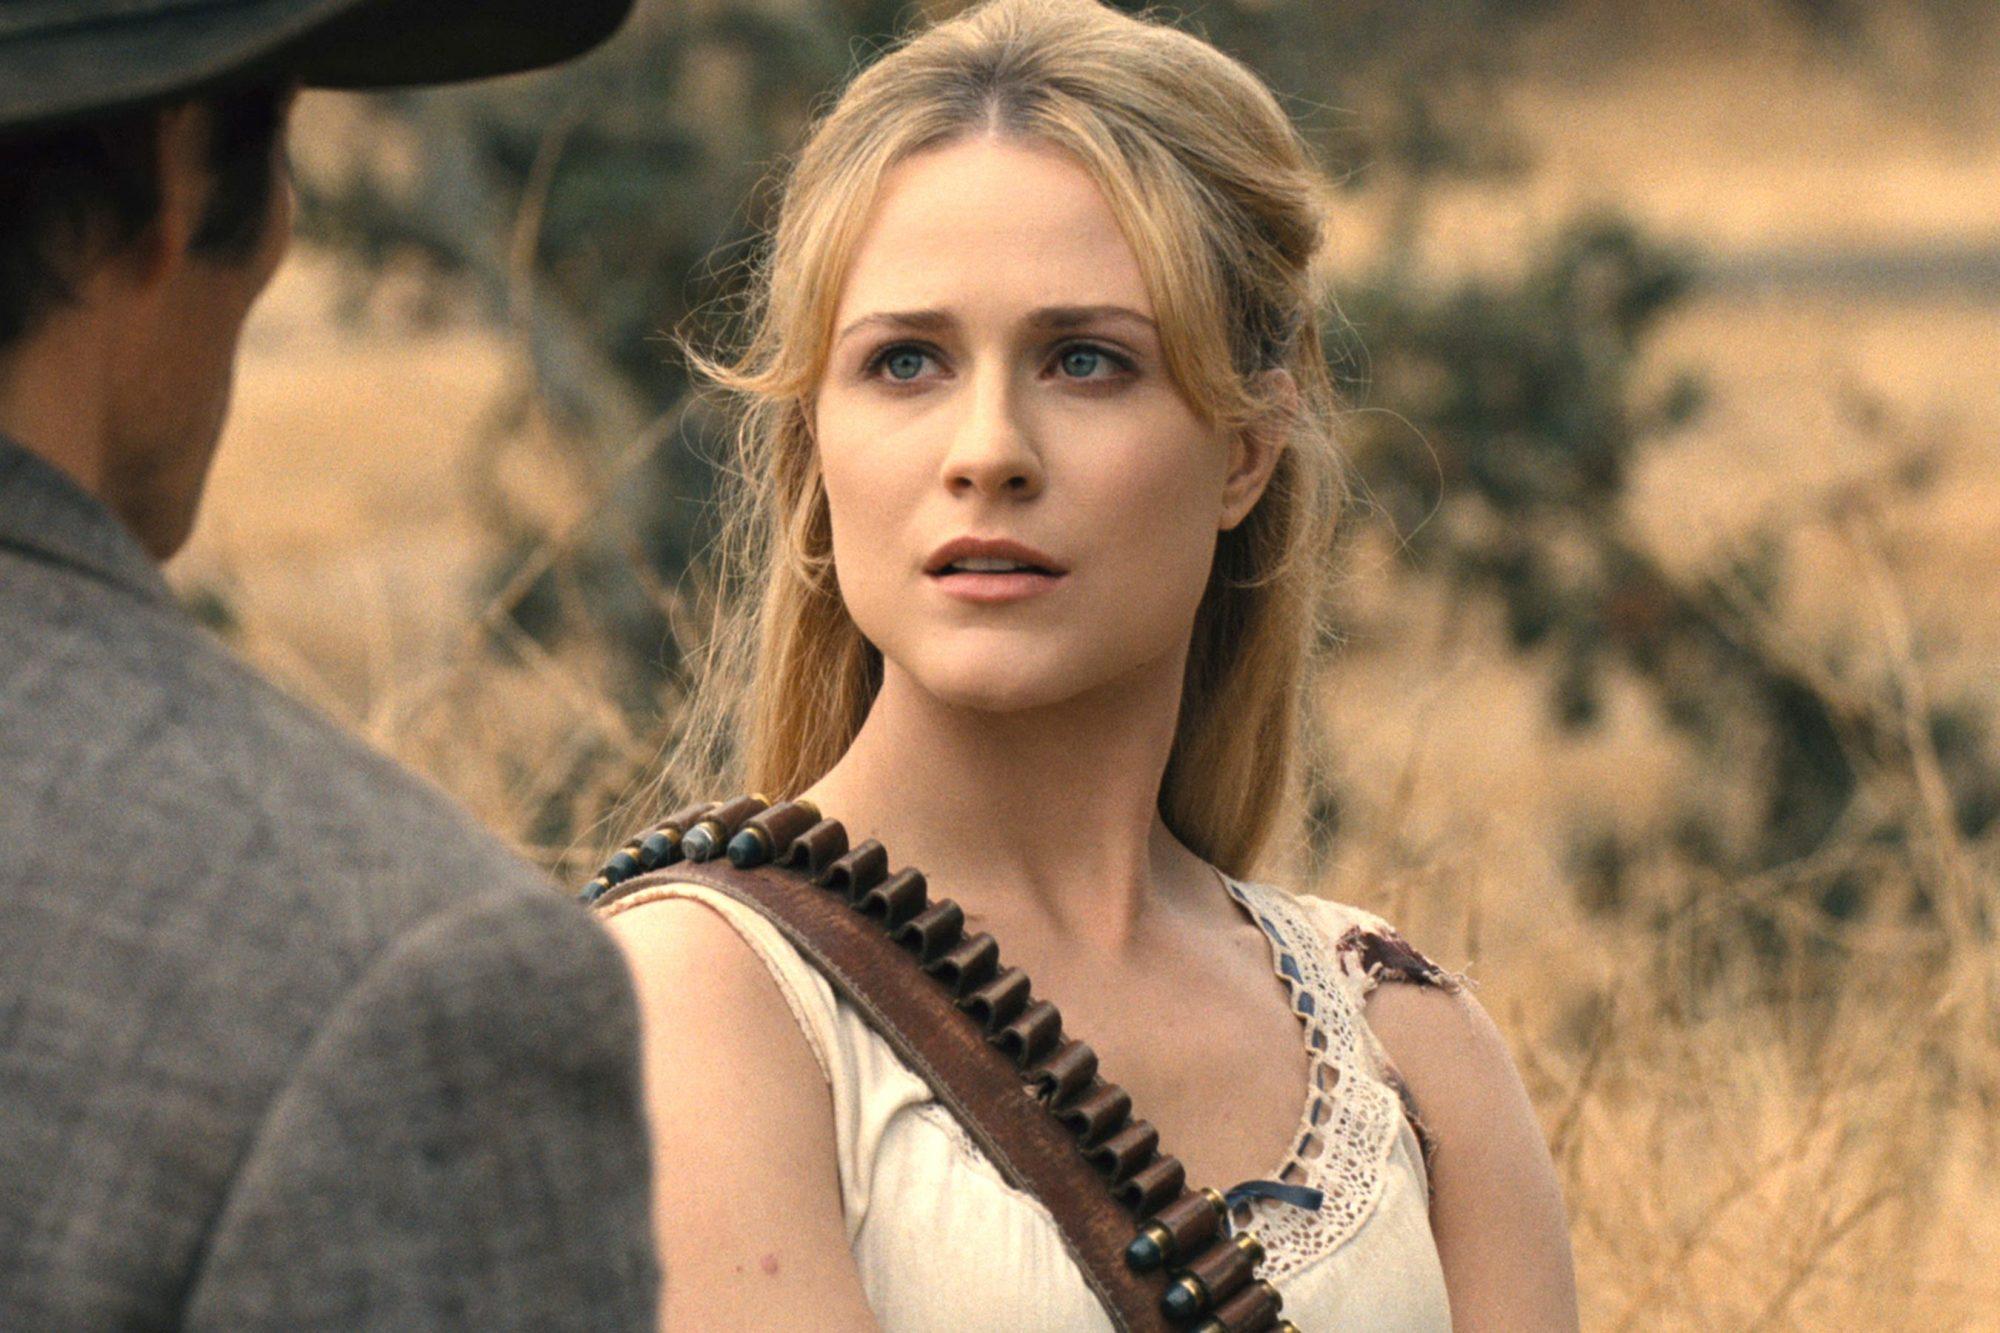 Episode 15 (season 2, episode 5), debut 5/20/18: Evan Rachel Wood.photo: HBO